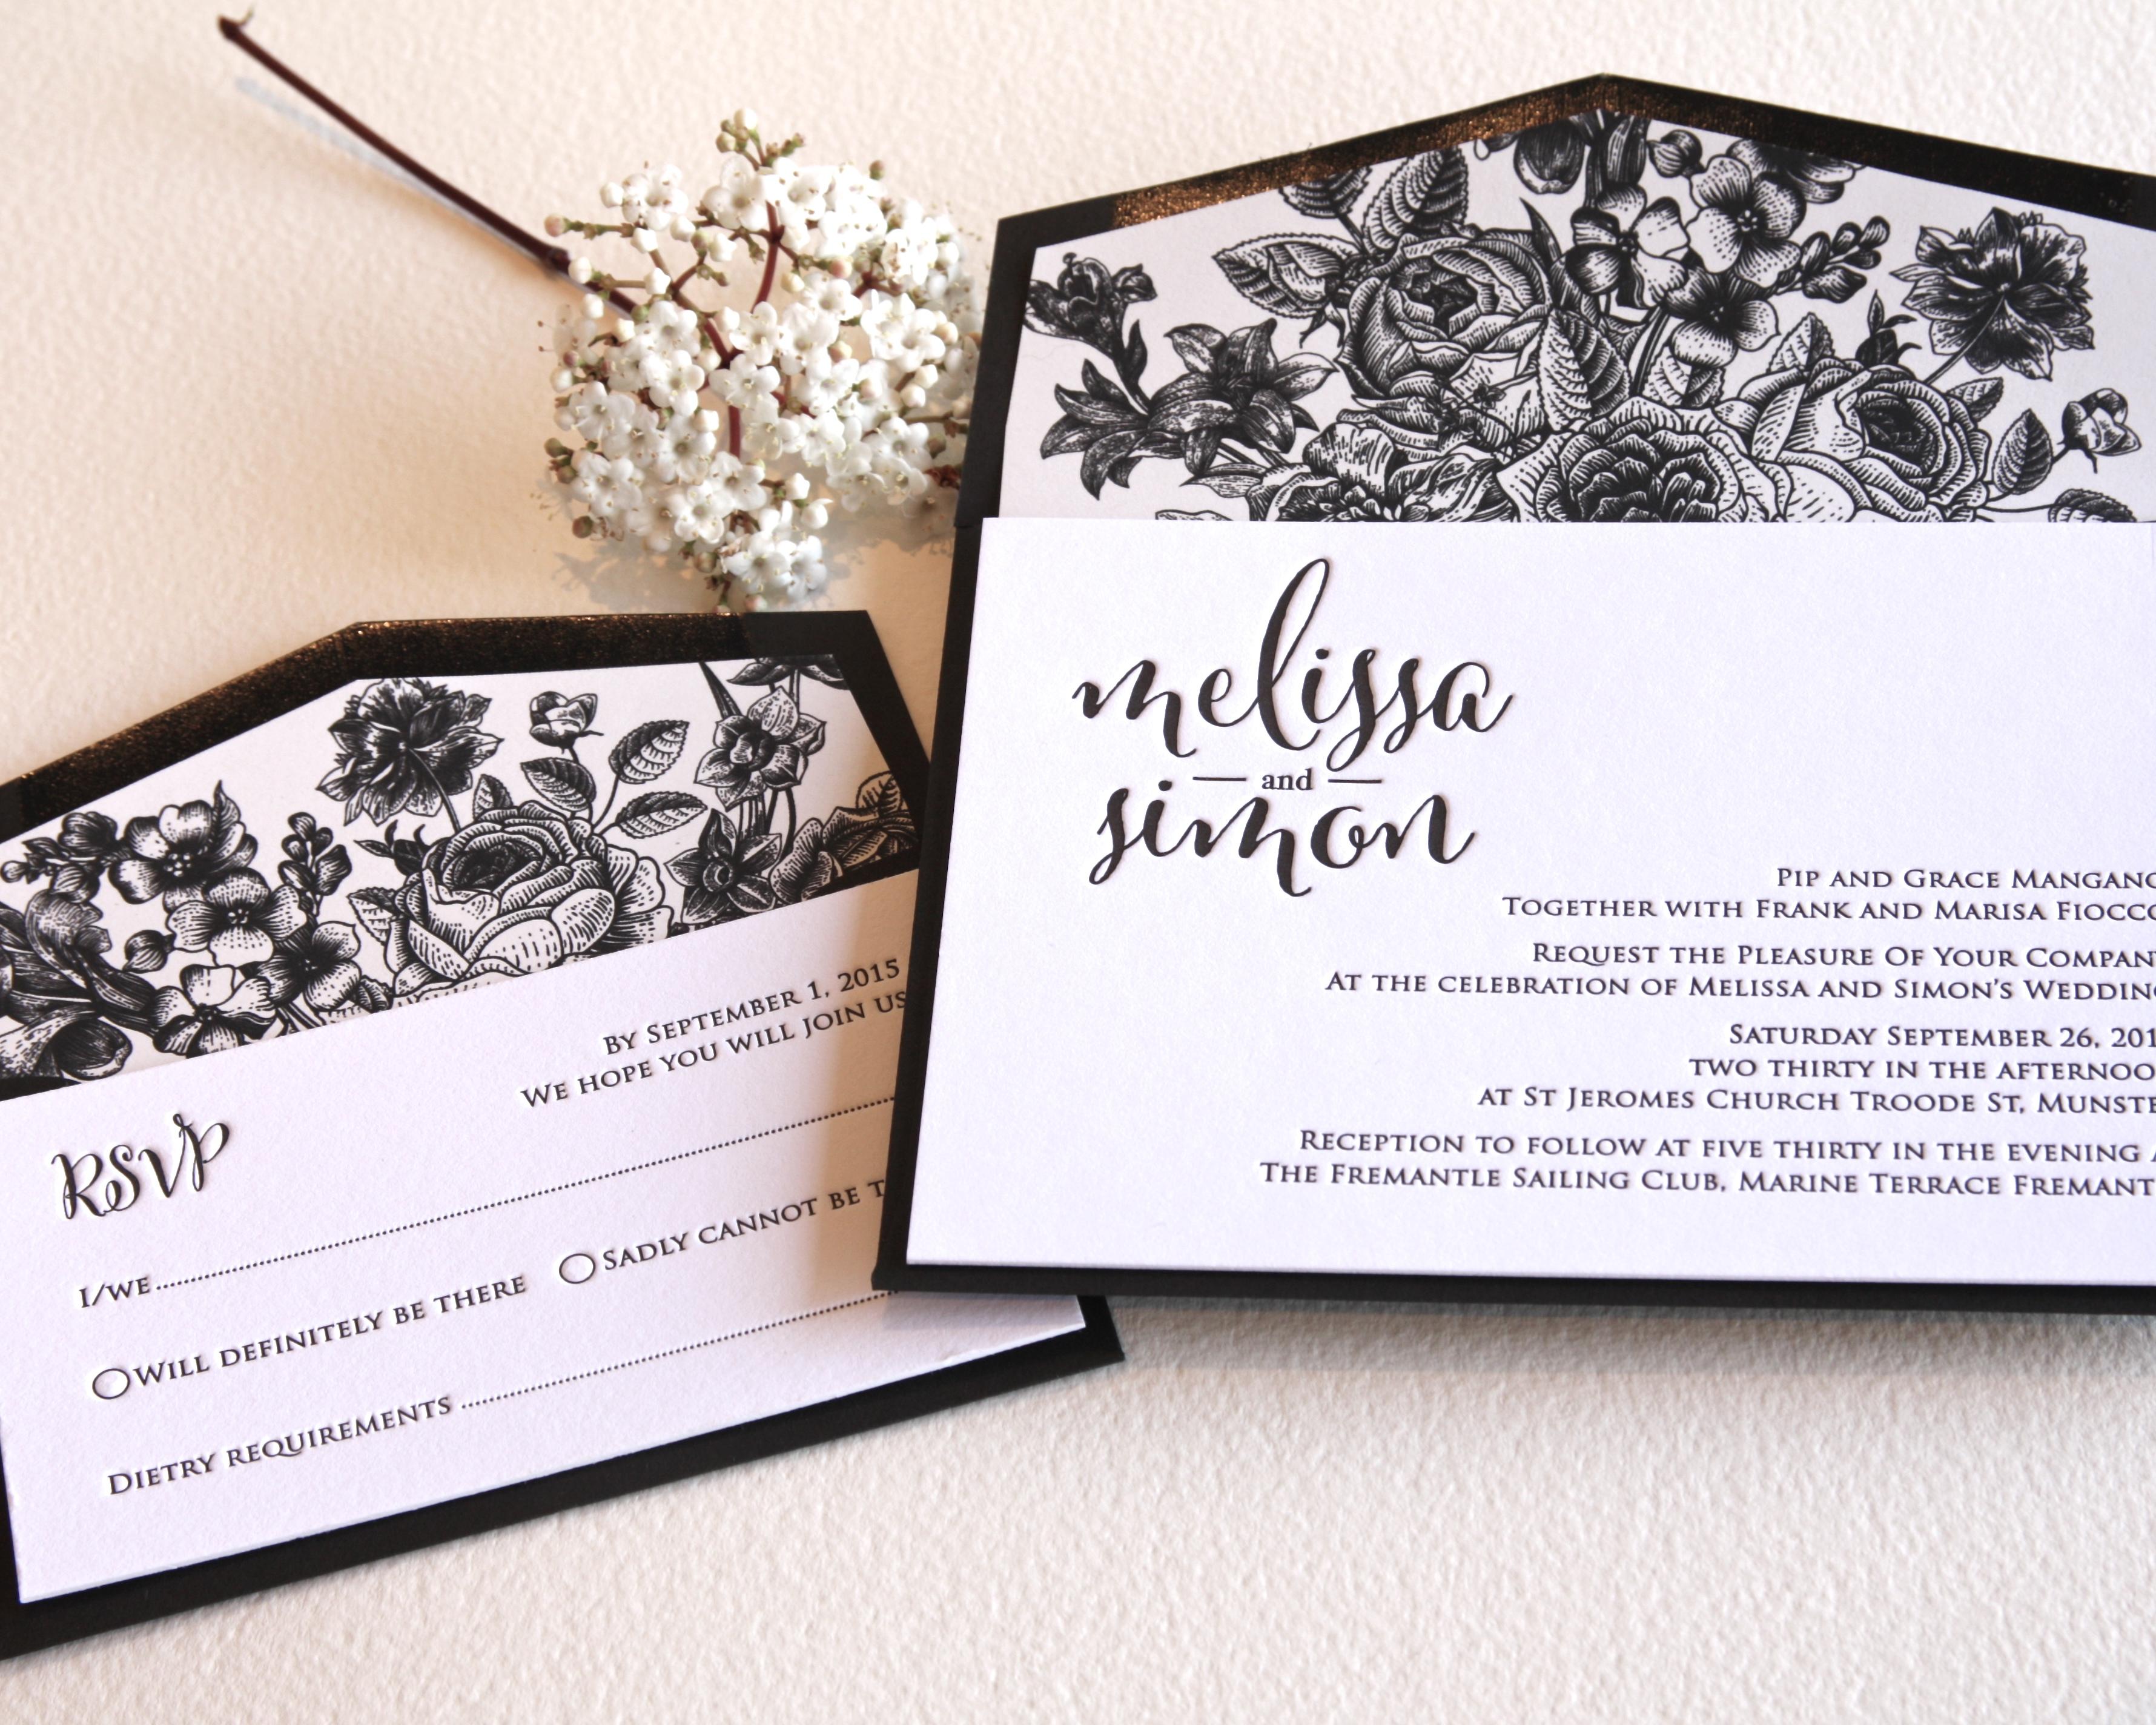 monochrome letterpress wedding